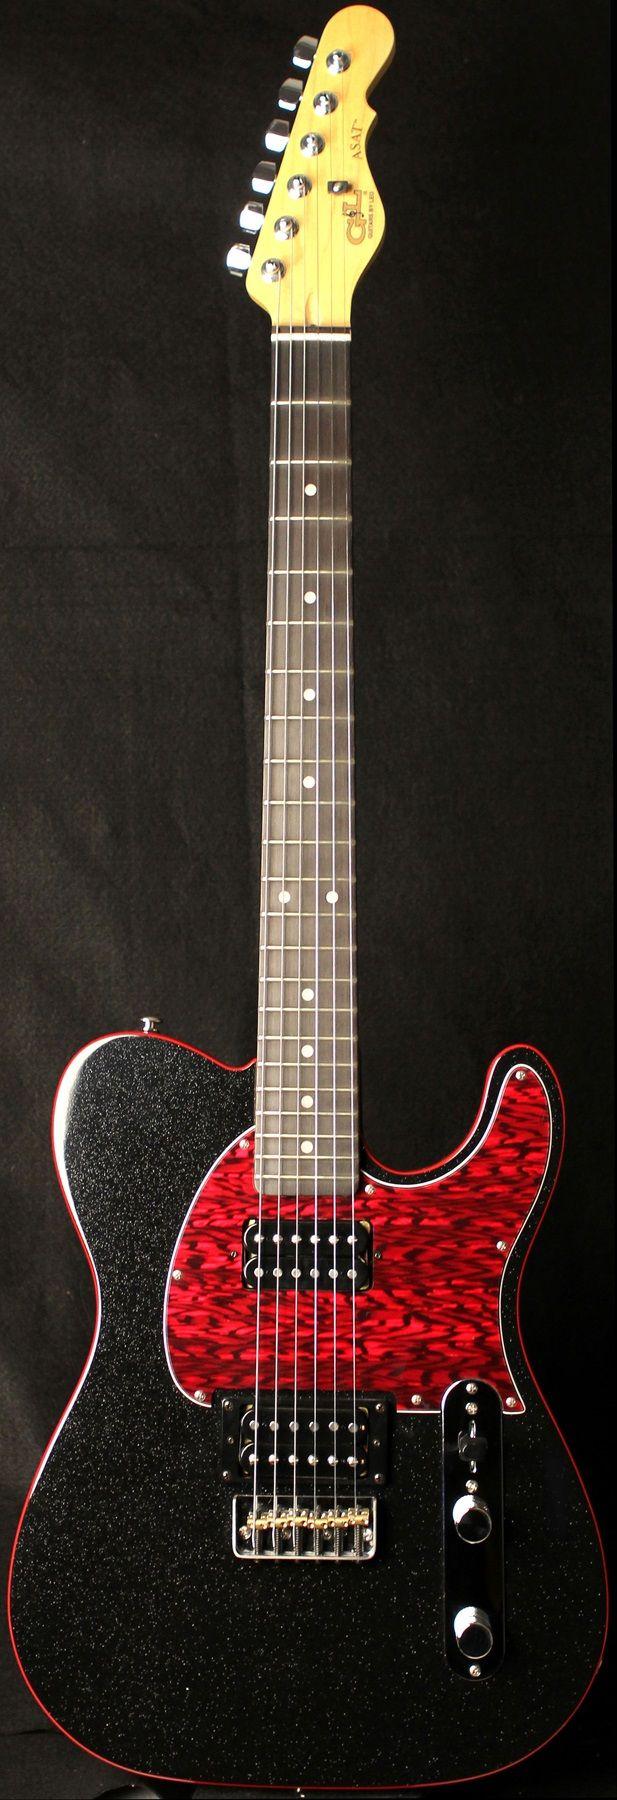 G&L Guitars ASAT® Deluxe, Galaxy Black Metallic finish over Western Sugared Pine